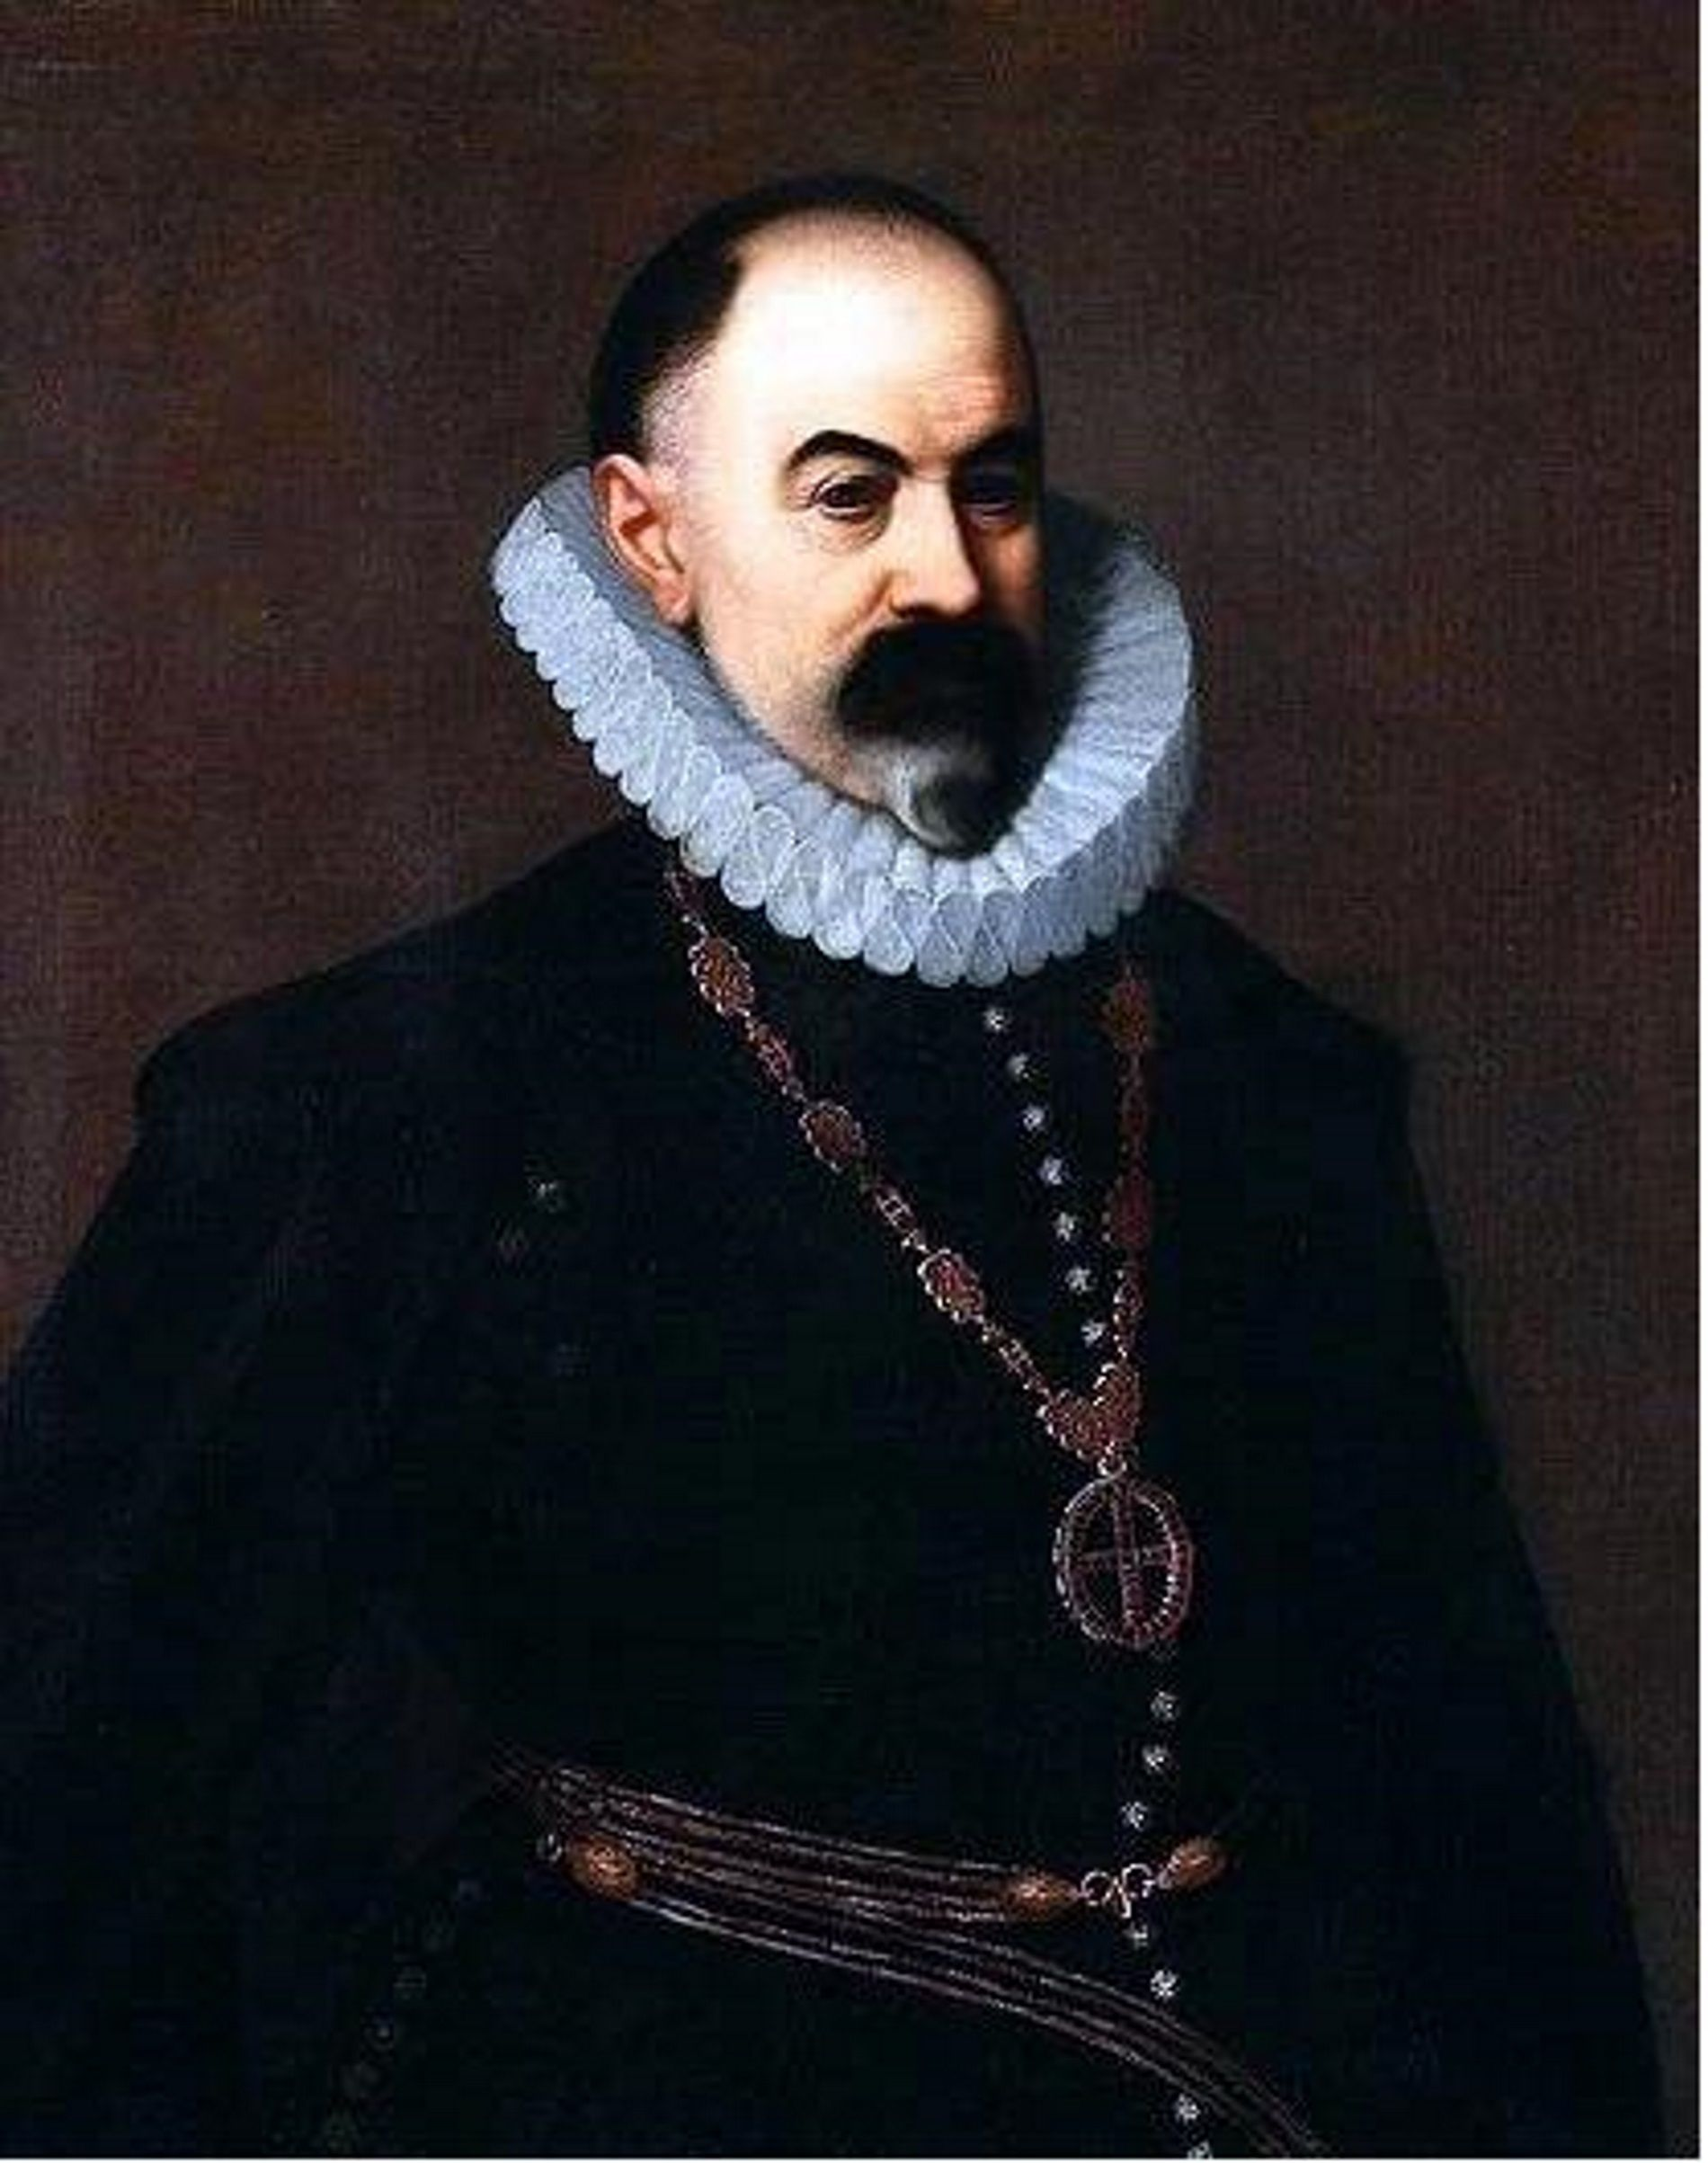 Pedro Franqueza BO